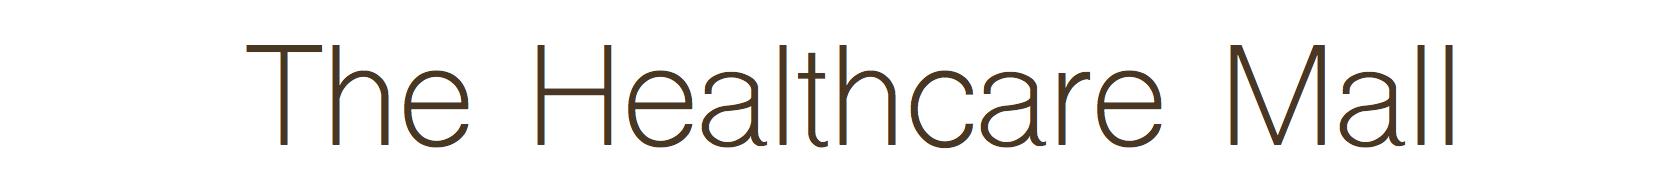 The Healthcare Mall / ザ・ヘルスケアモール